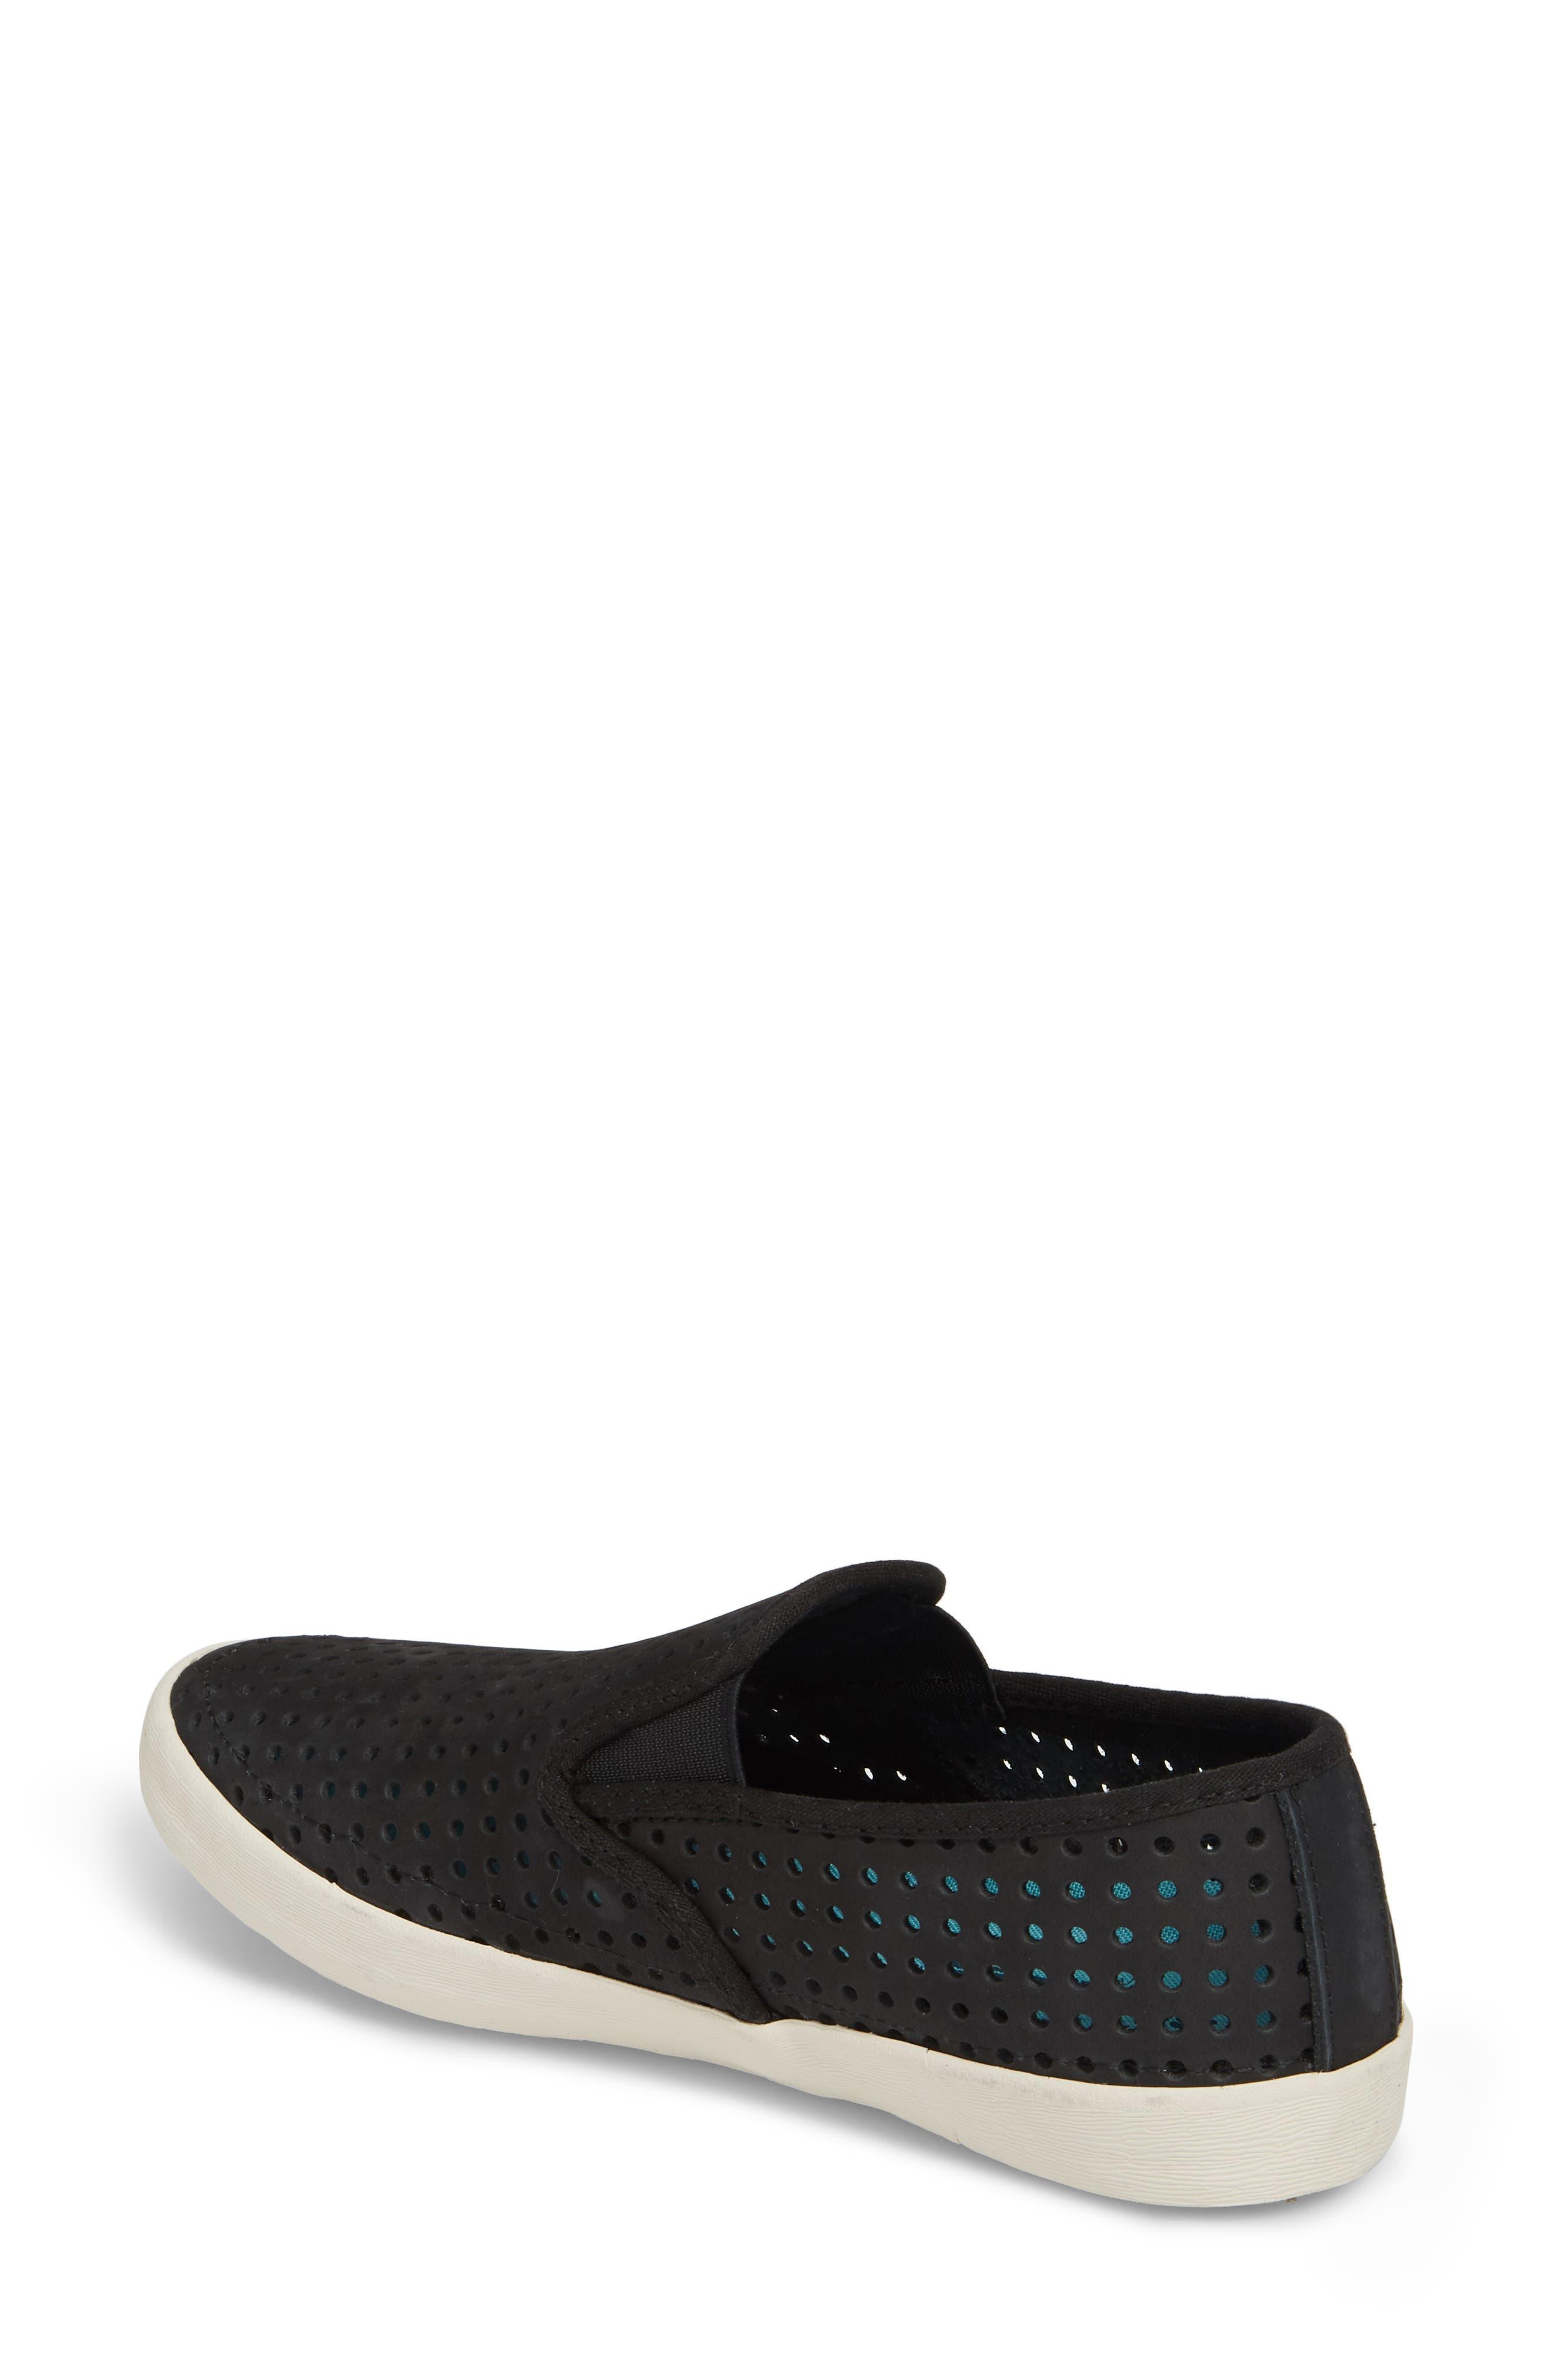 Baja Perforated Slip-On Sneaker,                             Alternate thumbnail 2, color,                             BLACK